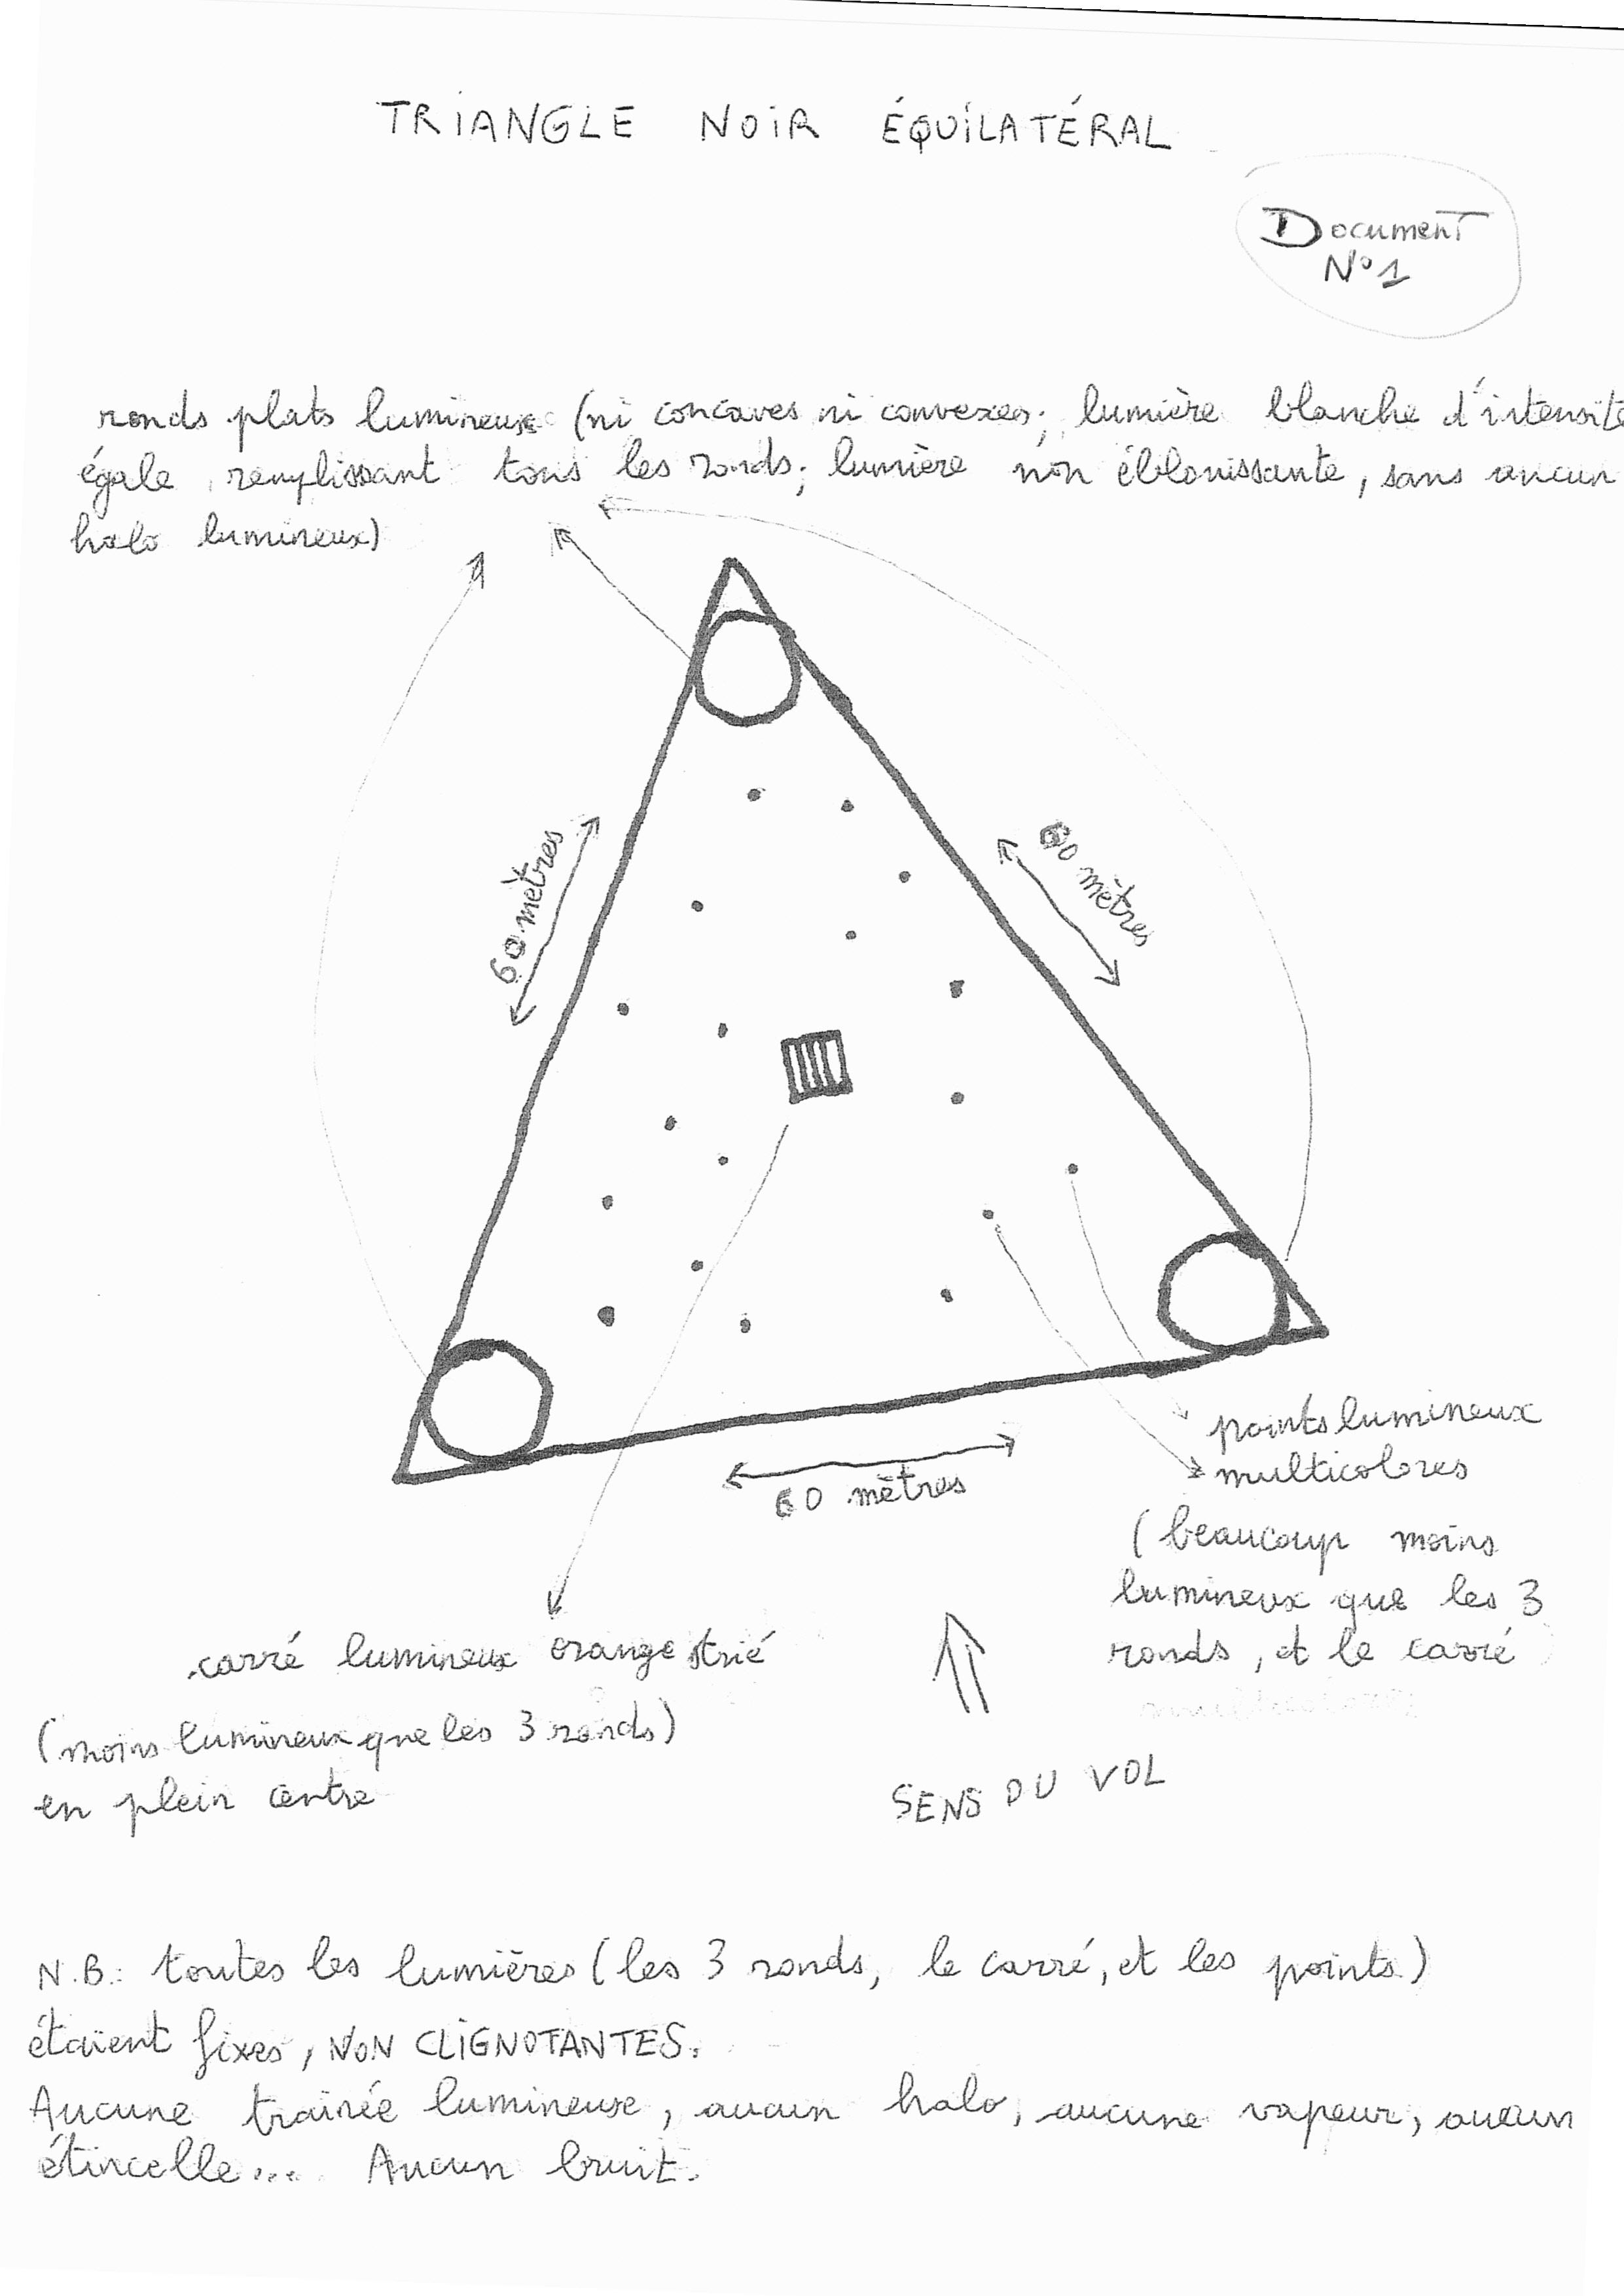 IMAGE 12. Affaire Xavier S.